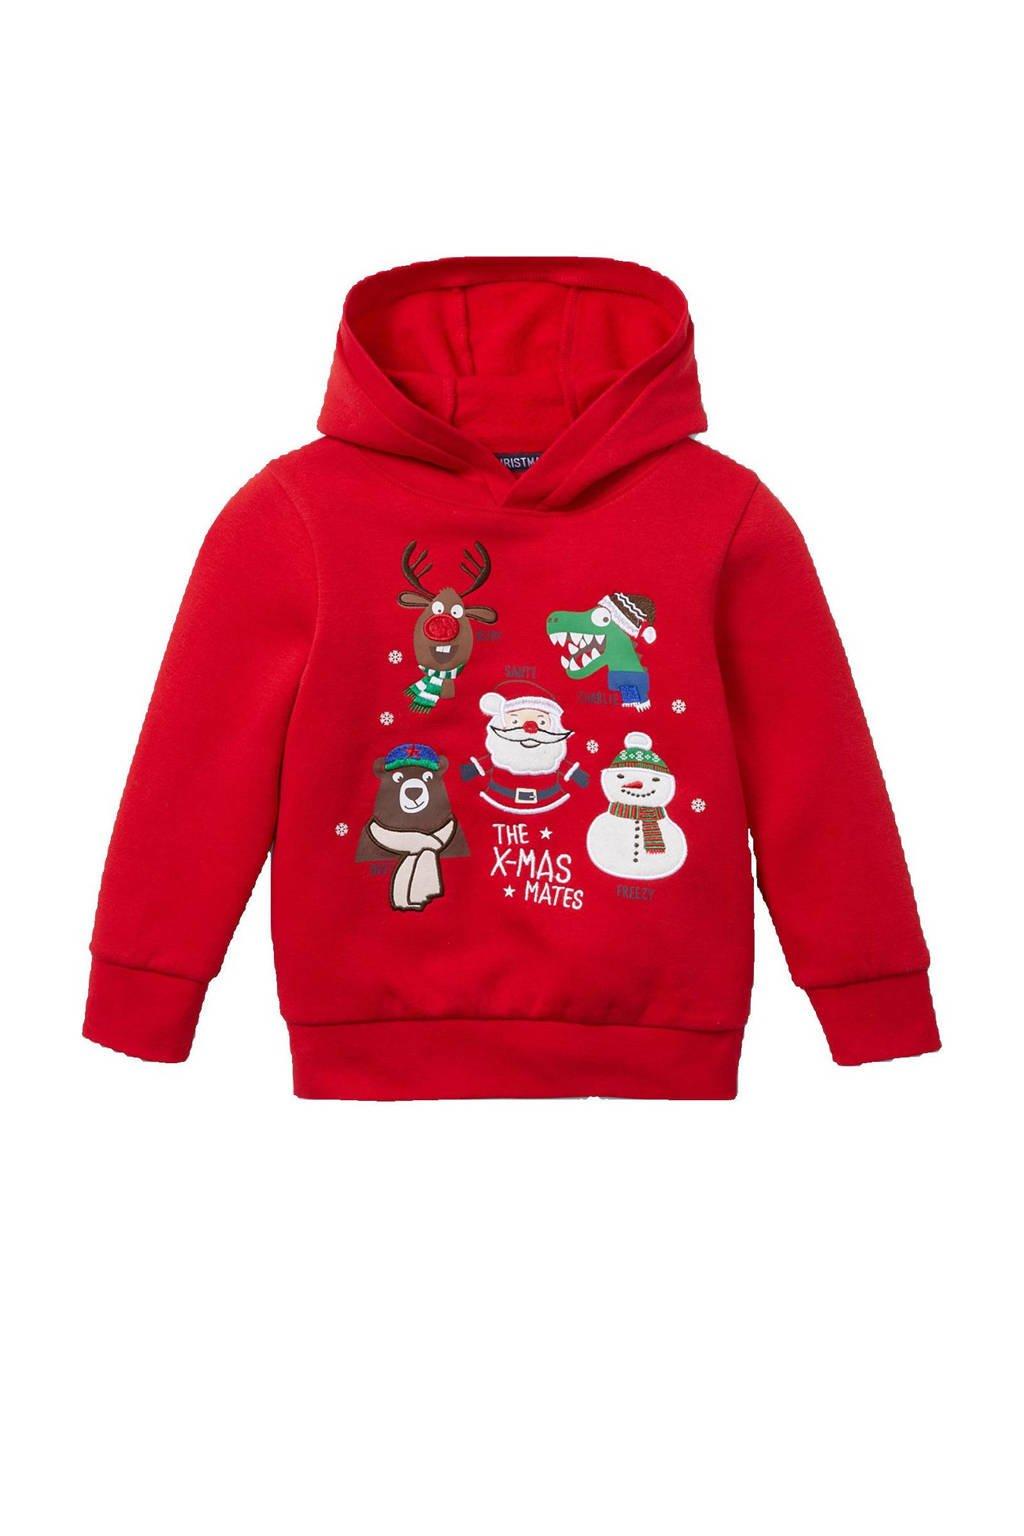 C&A Palomino kersthoodie rood/wit/groen, Rood